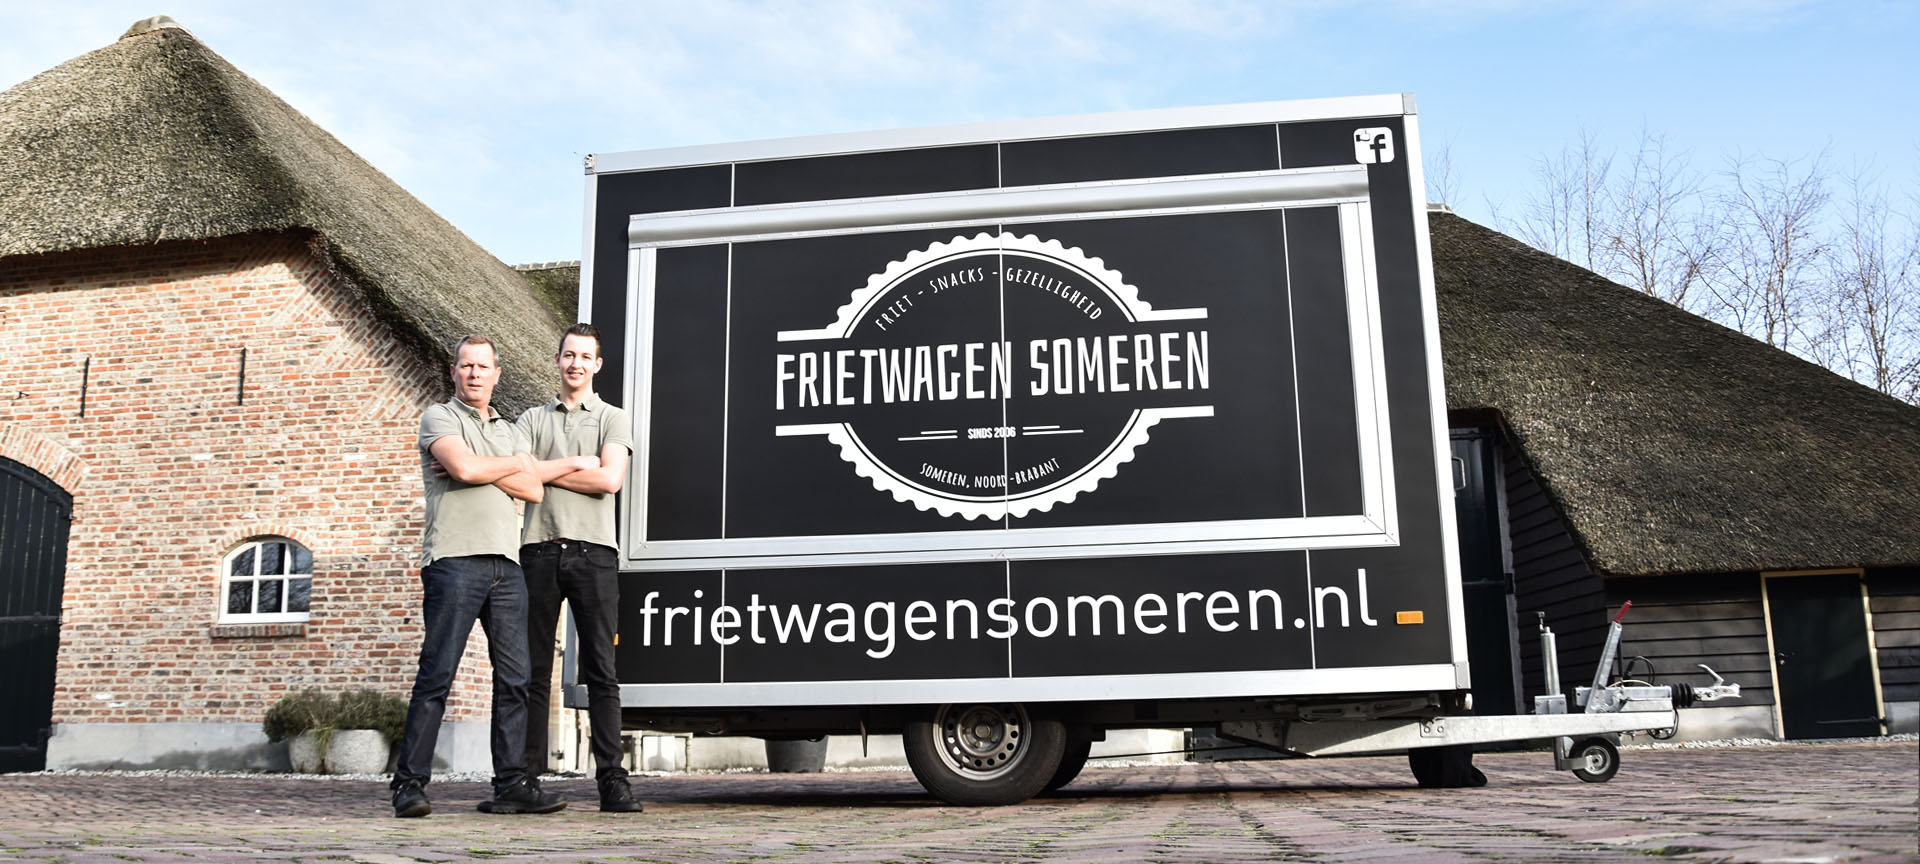 Waarom Frietwagen Someren?